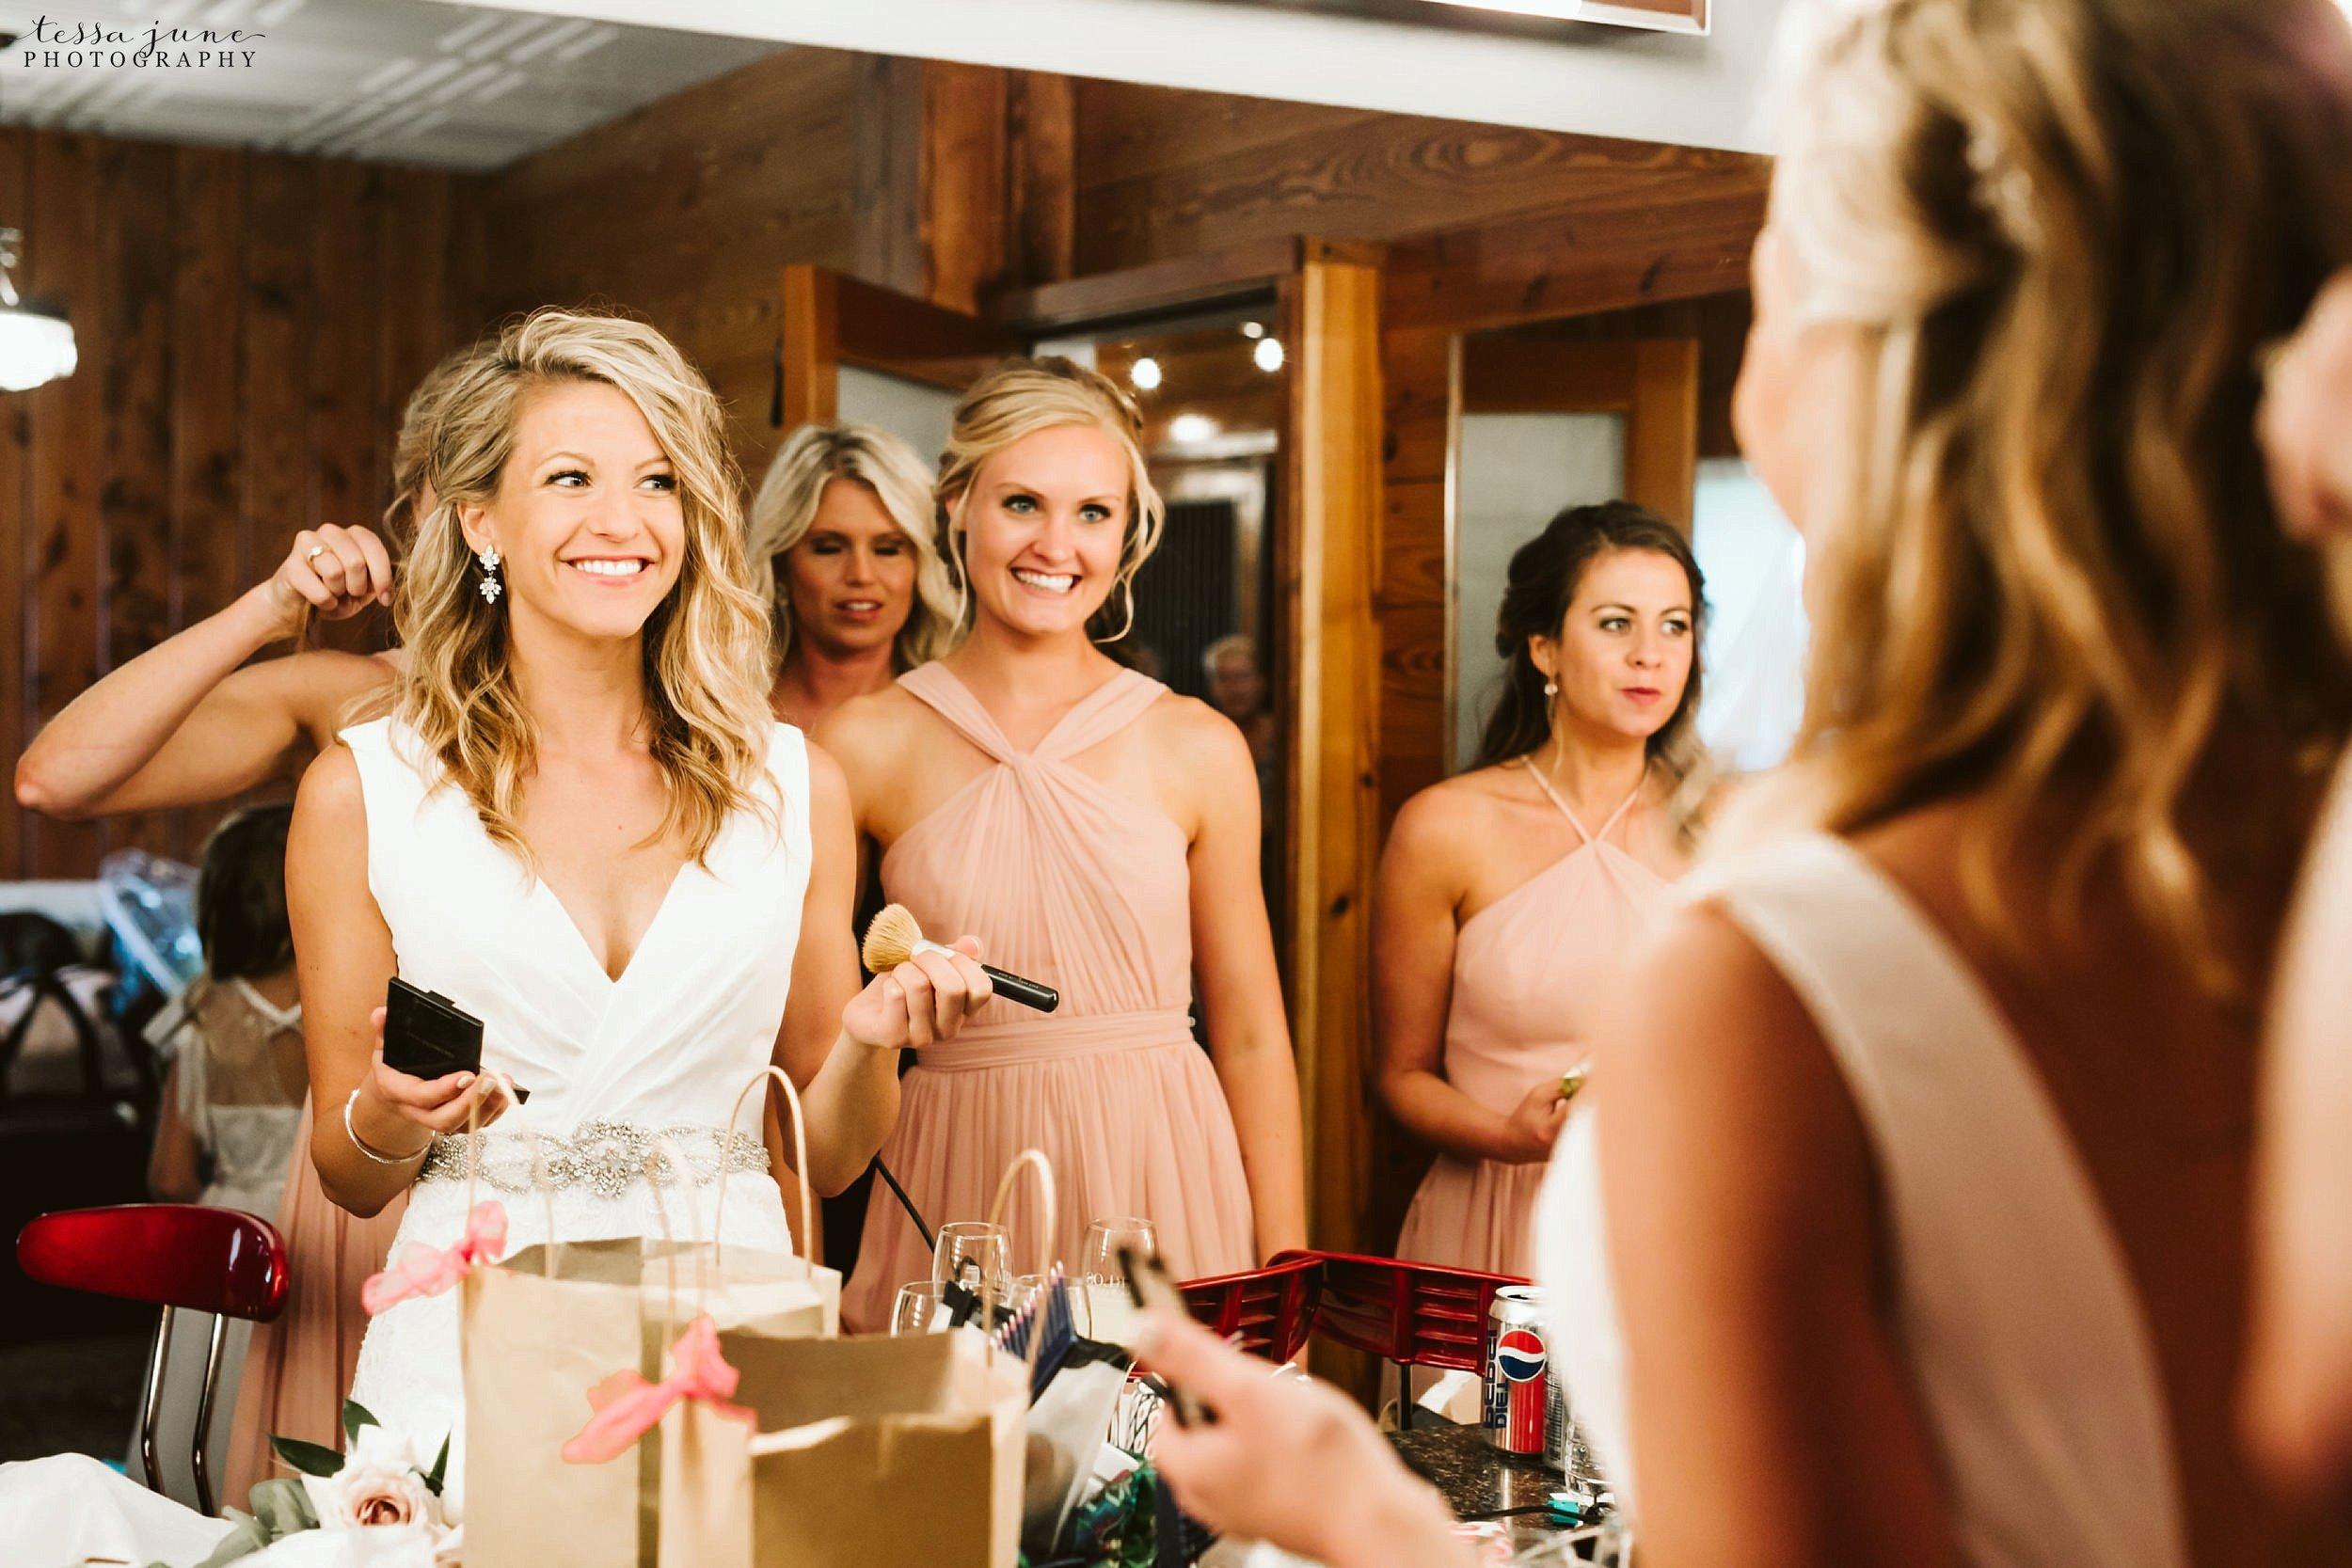 carlos-creek-winery-wedding-summer-pristine-floral-blush-pink-navy-alexandria-minnesota-90.jpg